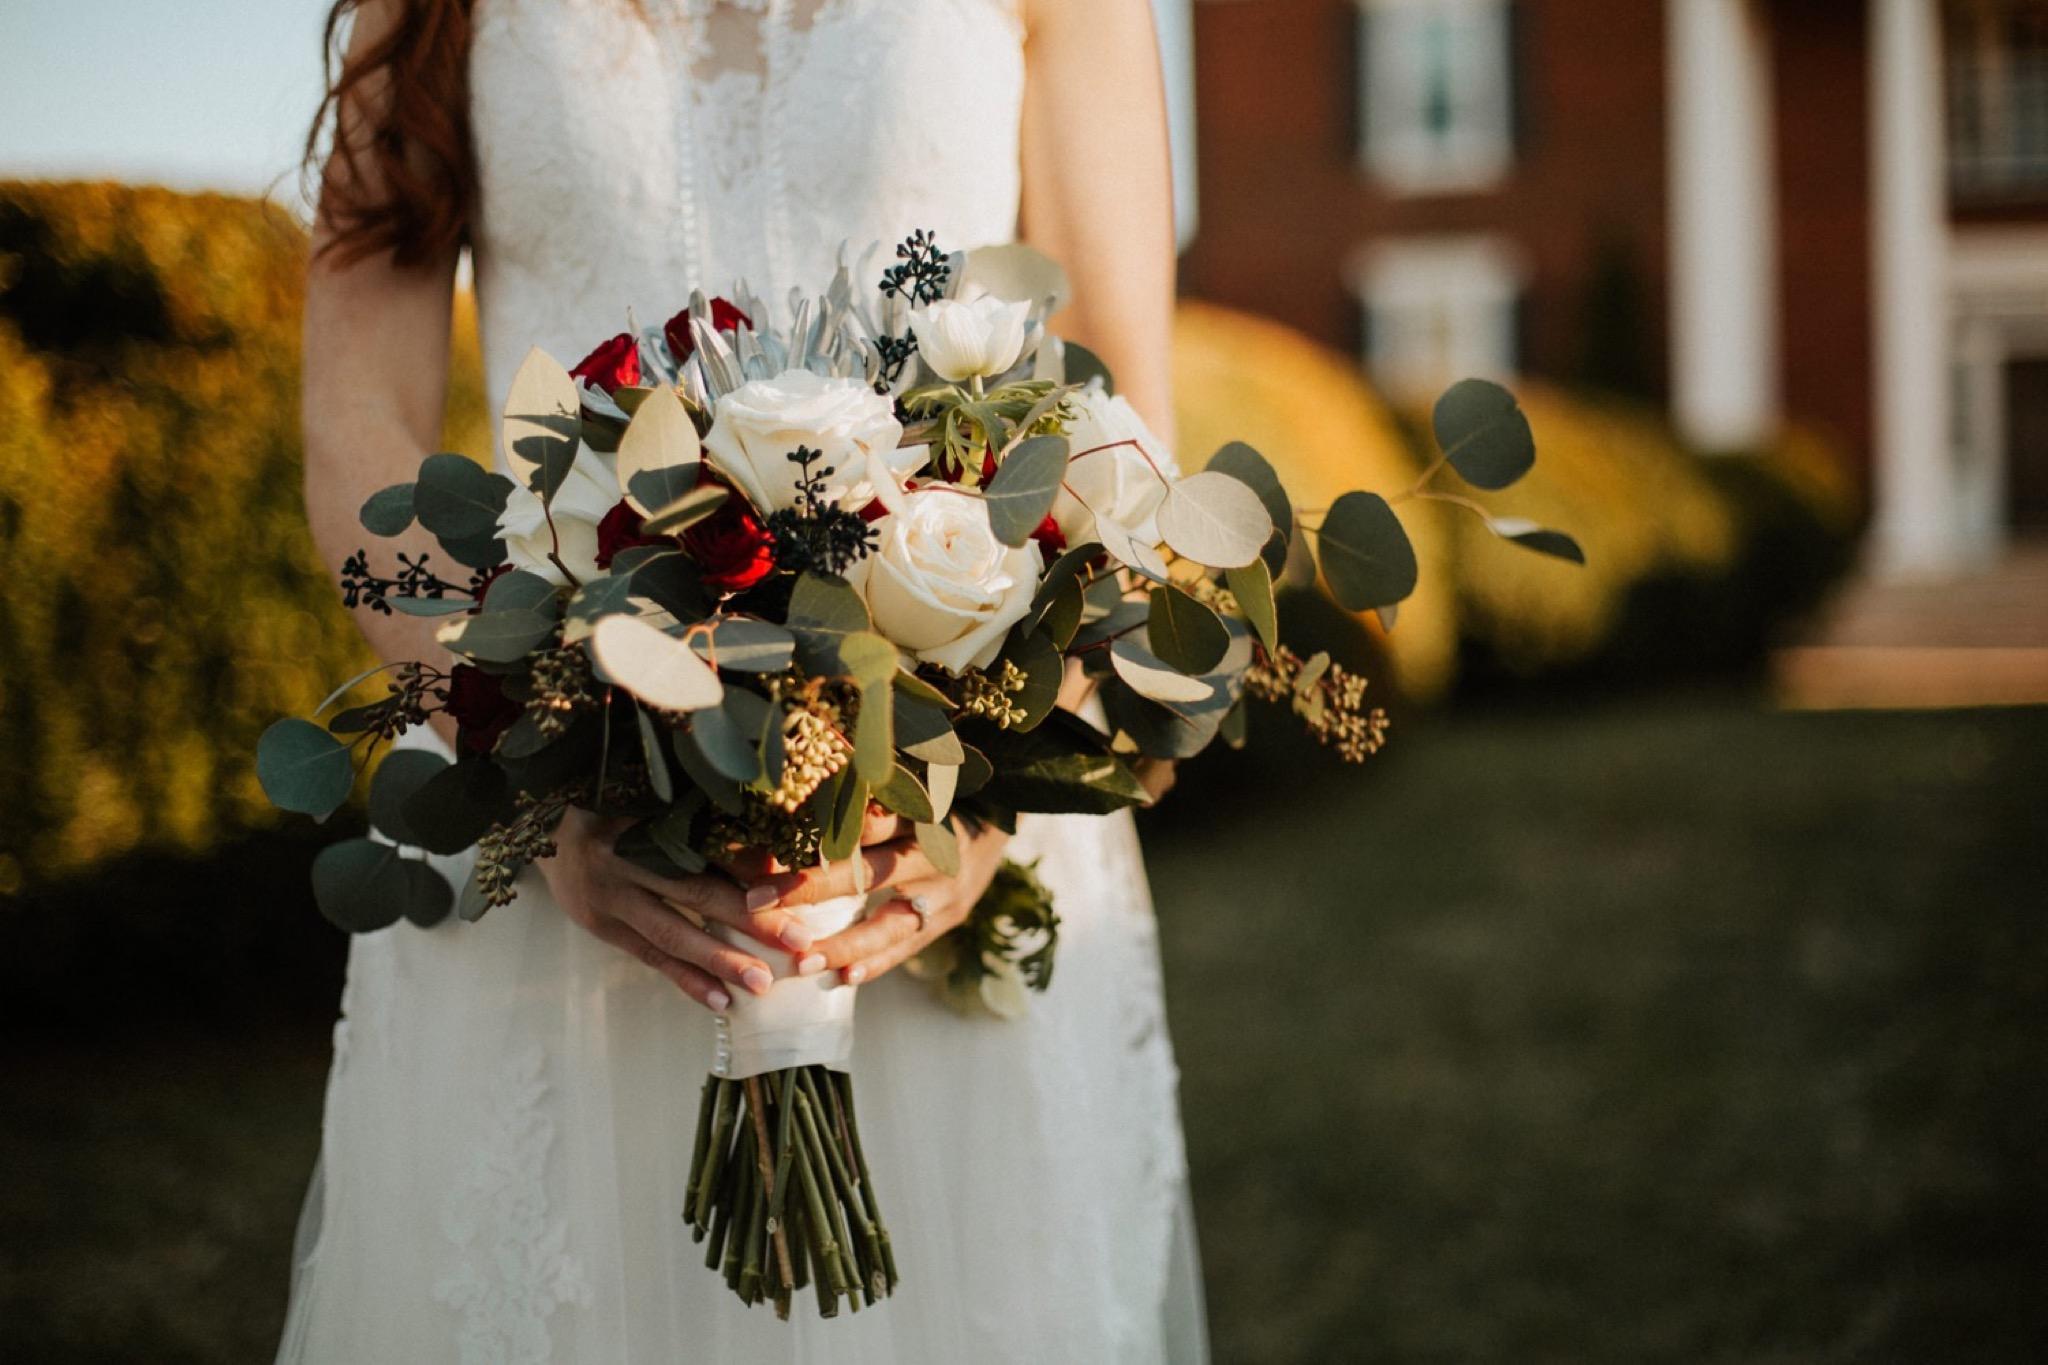 73_West Manor Estate Weddings - Pat Cori Photography-153_bride_VirginiaWeddingPhotographer_WestManorEstate_Portraits_Wedding.jpg